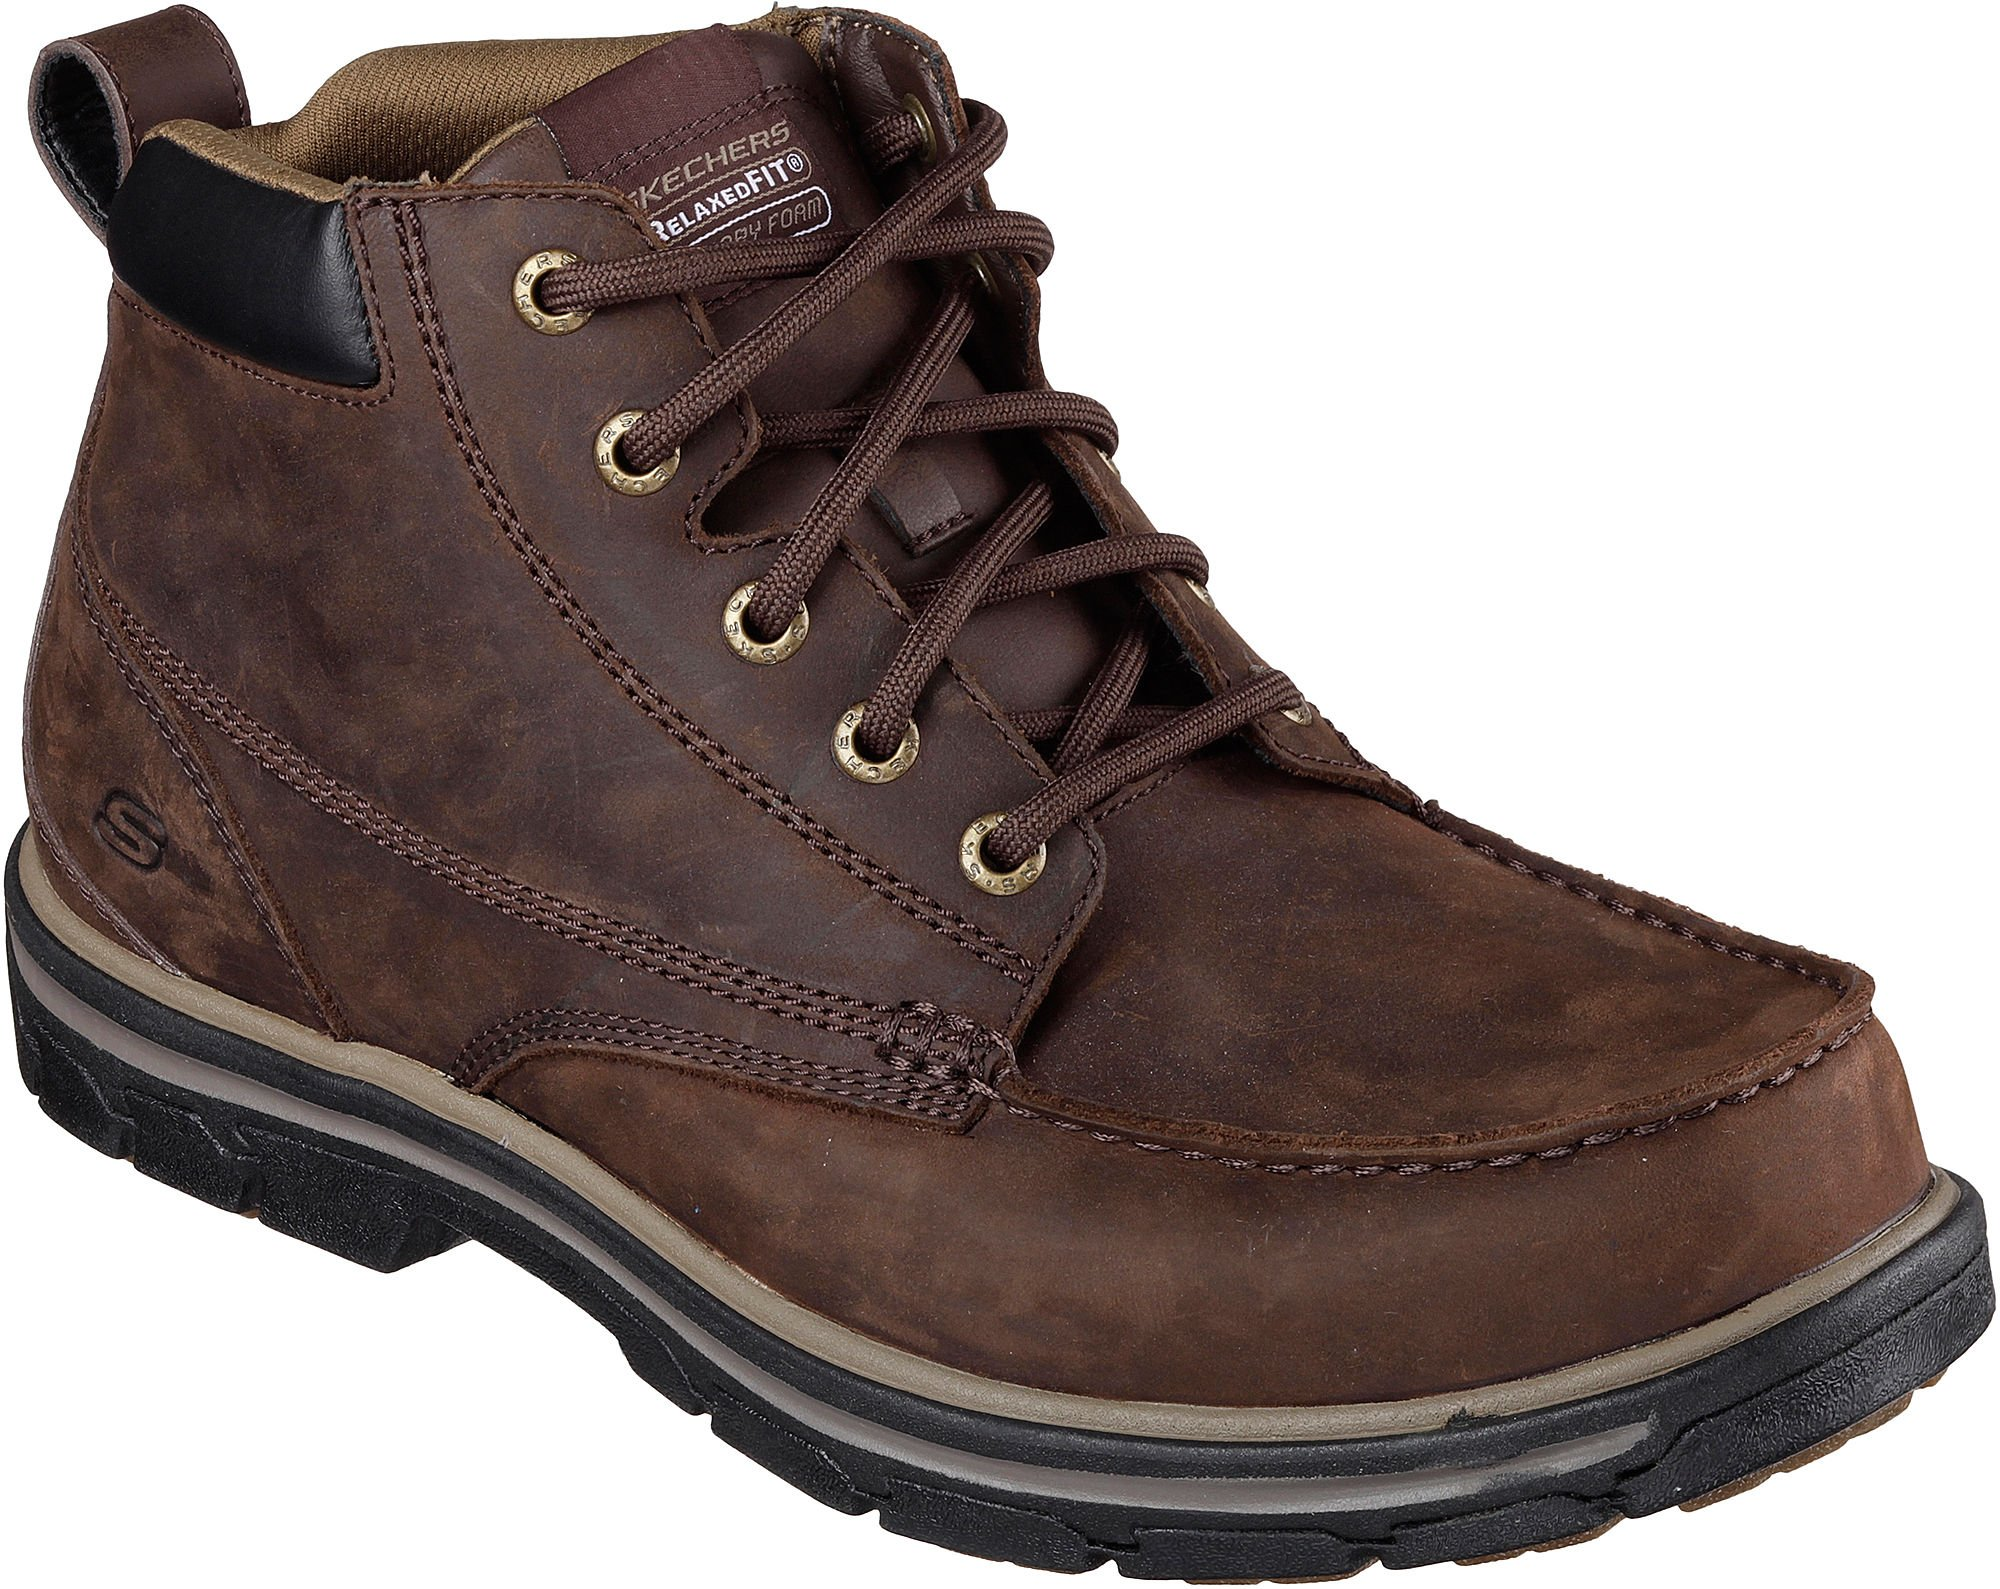 Skechers Segment-Barillo Brown Mens Ankle Hi Boot Size 10.5M